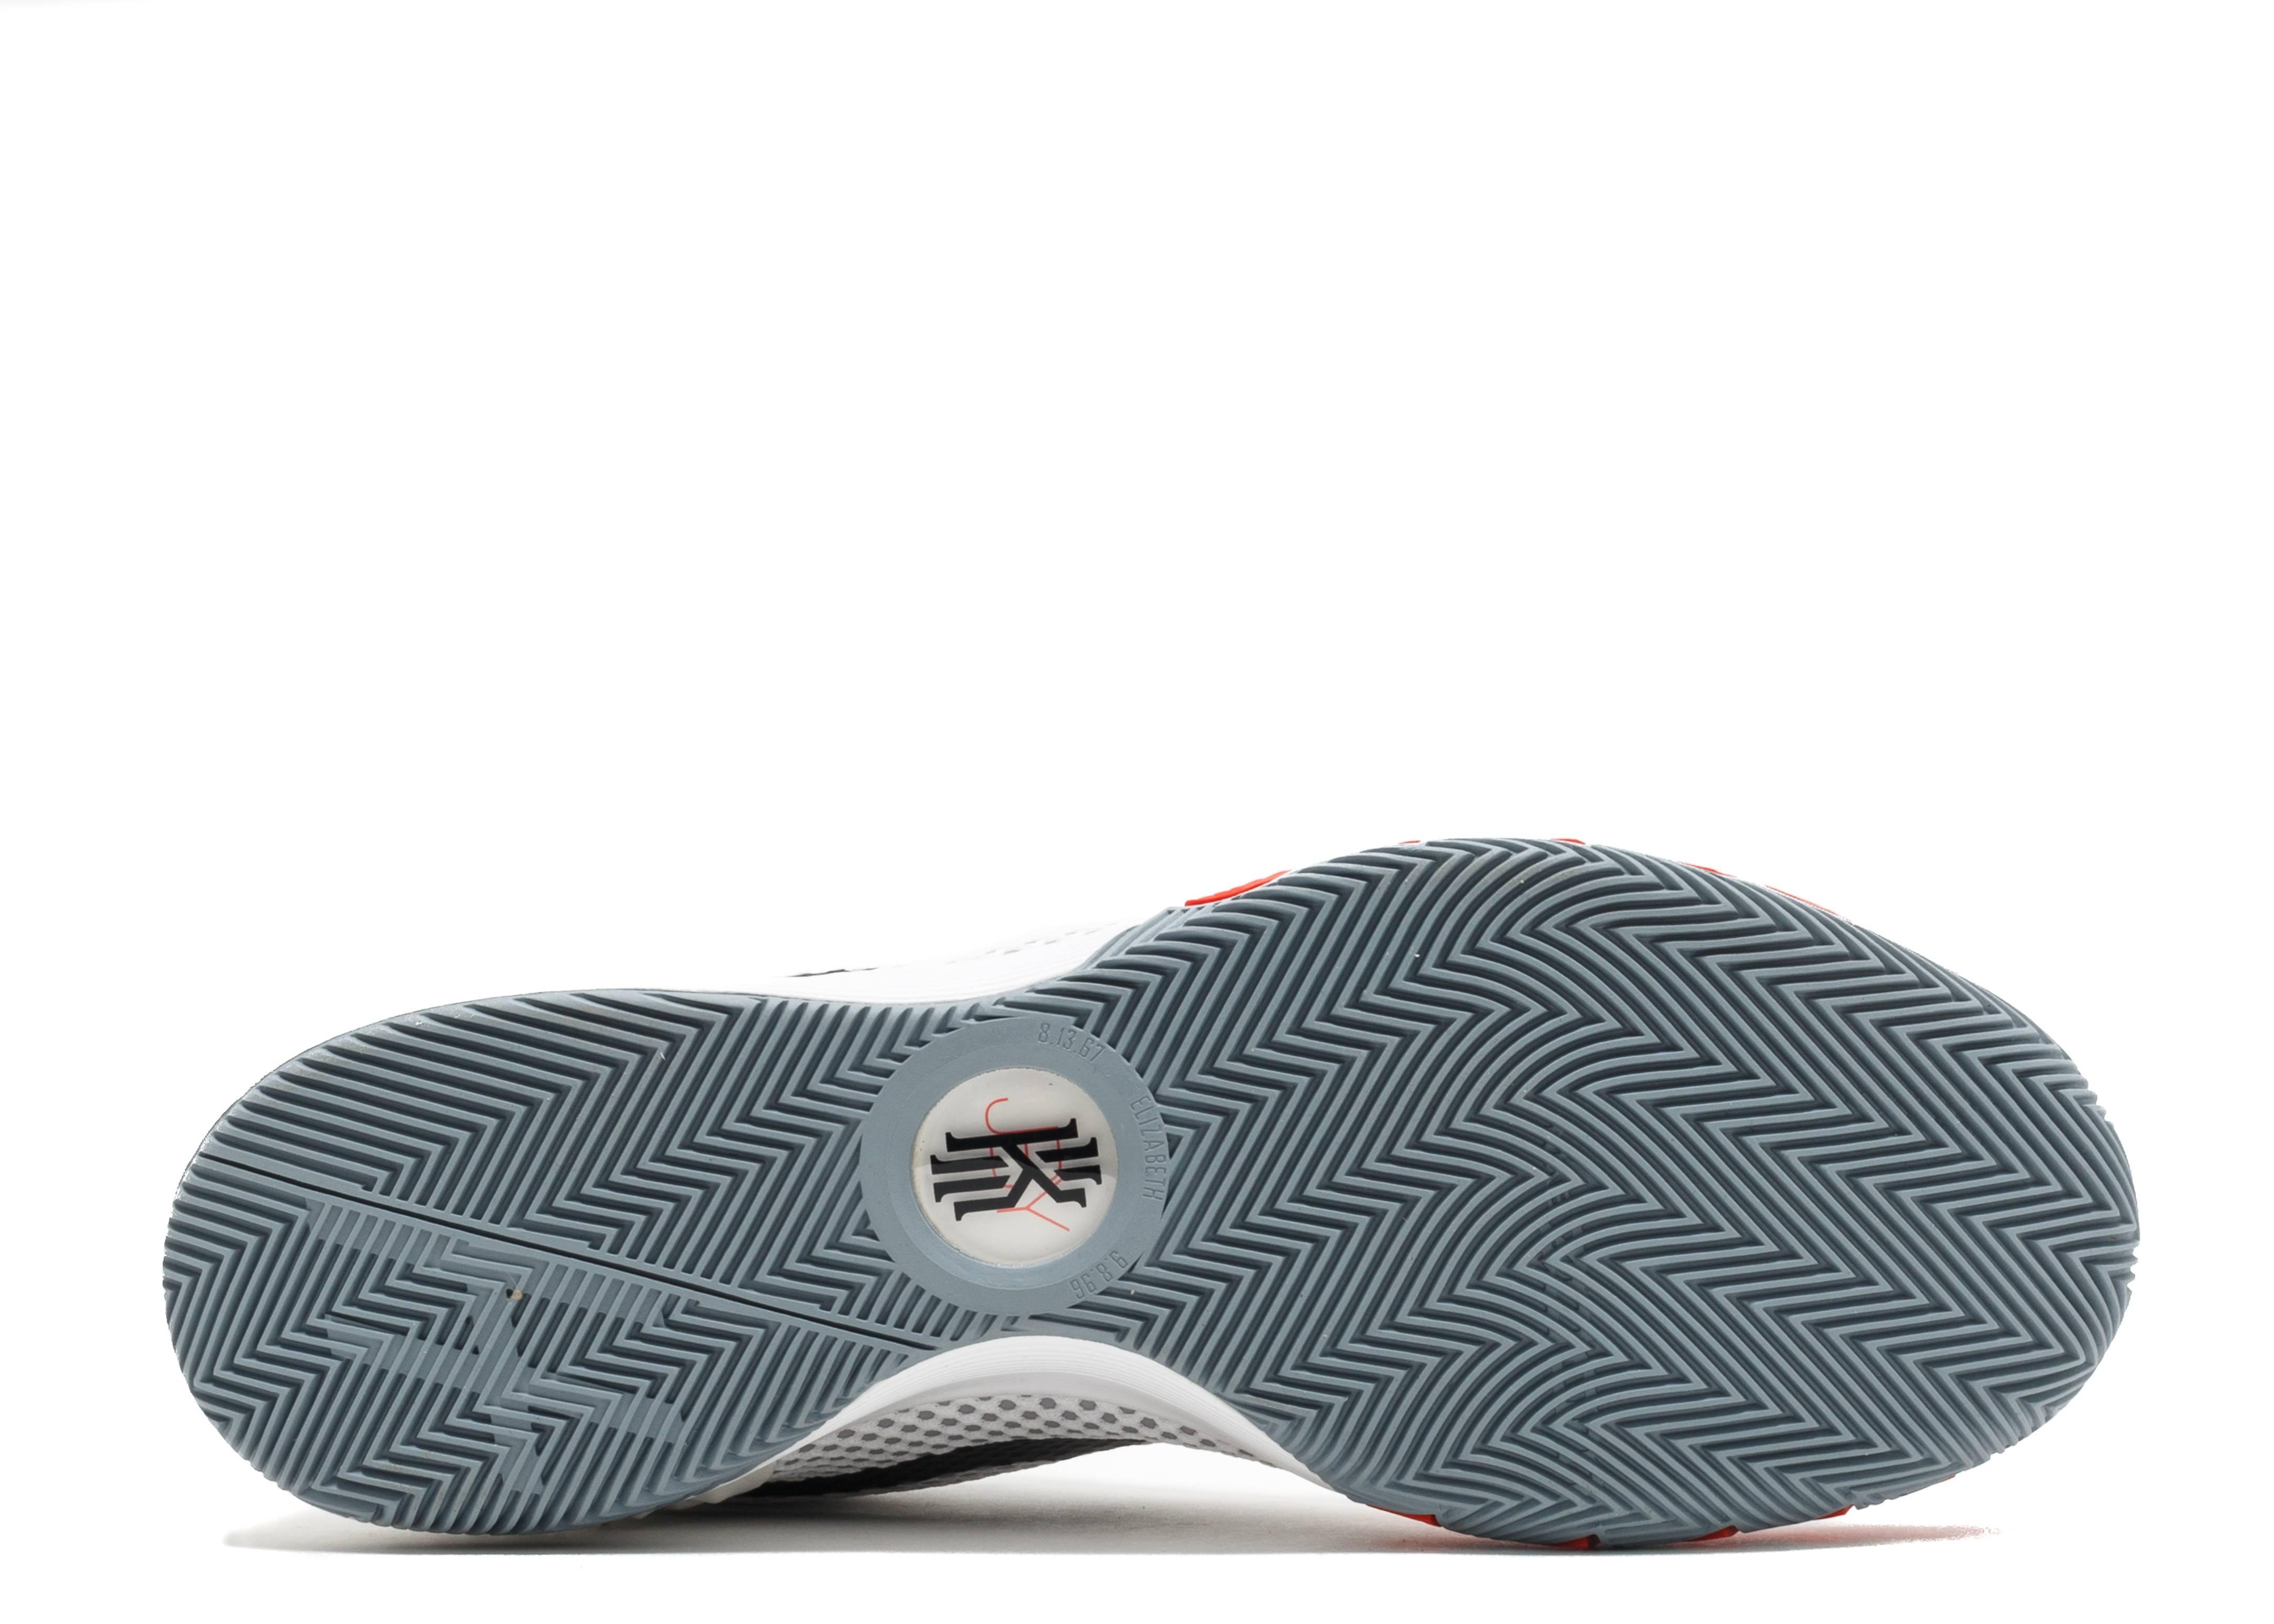 Kyrie 1 - Nike - 705277 100 - white black-dove grey-infrared ... 8c68d621d6